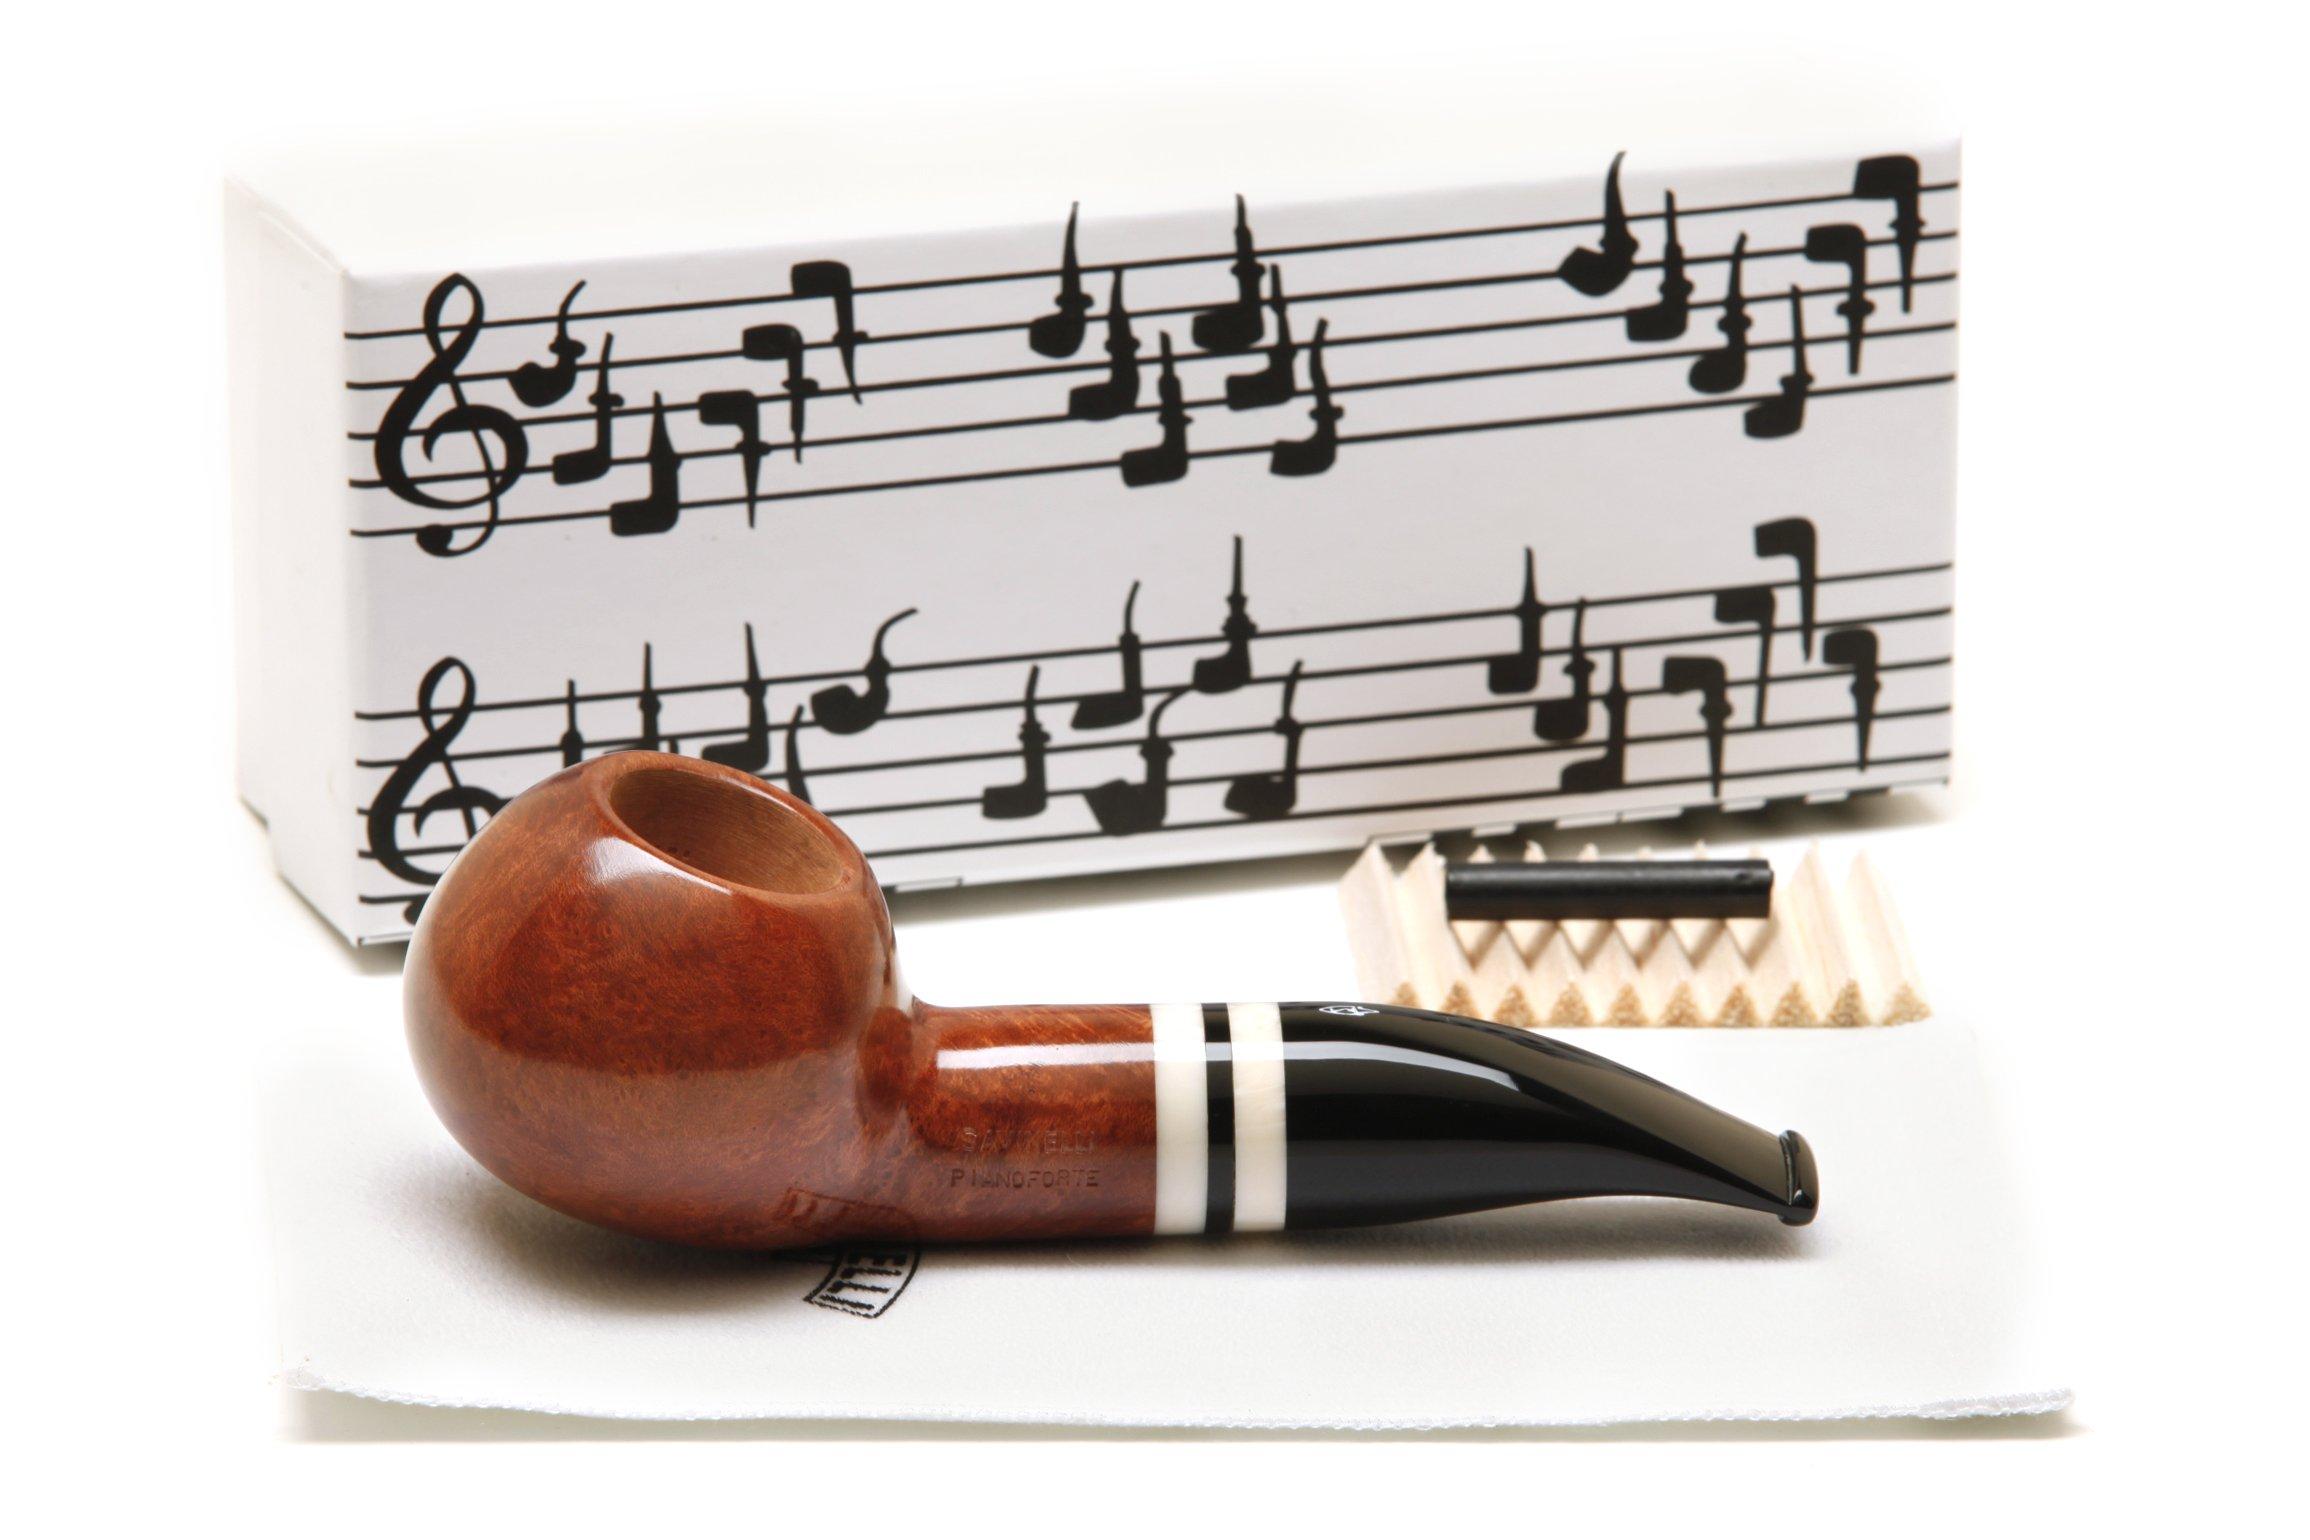 Savinelli Pianoforte 320 KS Smooth Tobacco Pipe